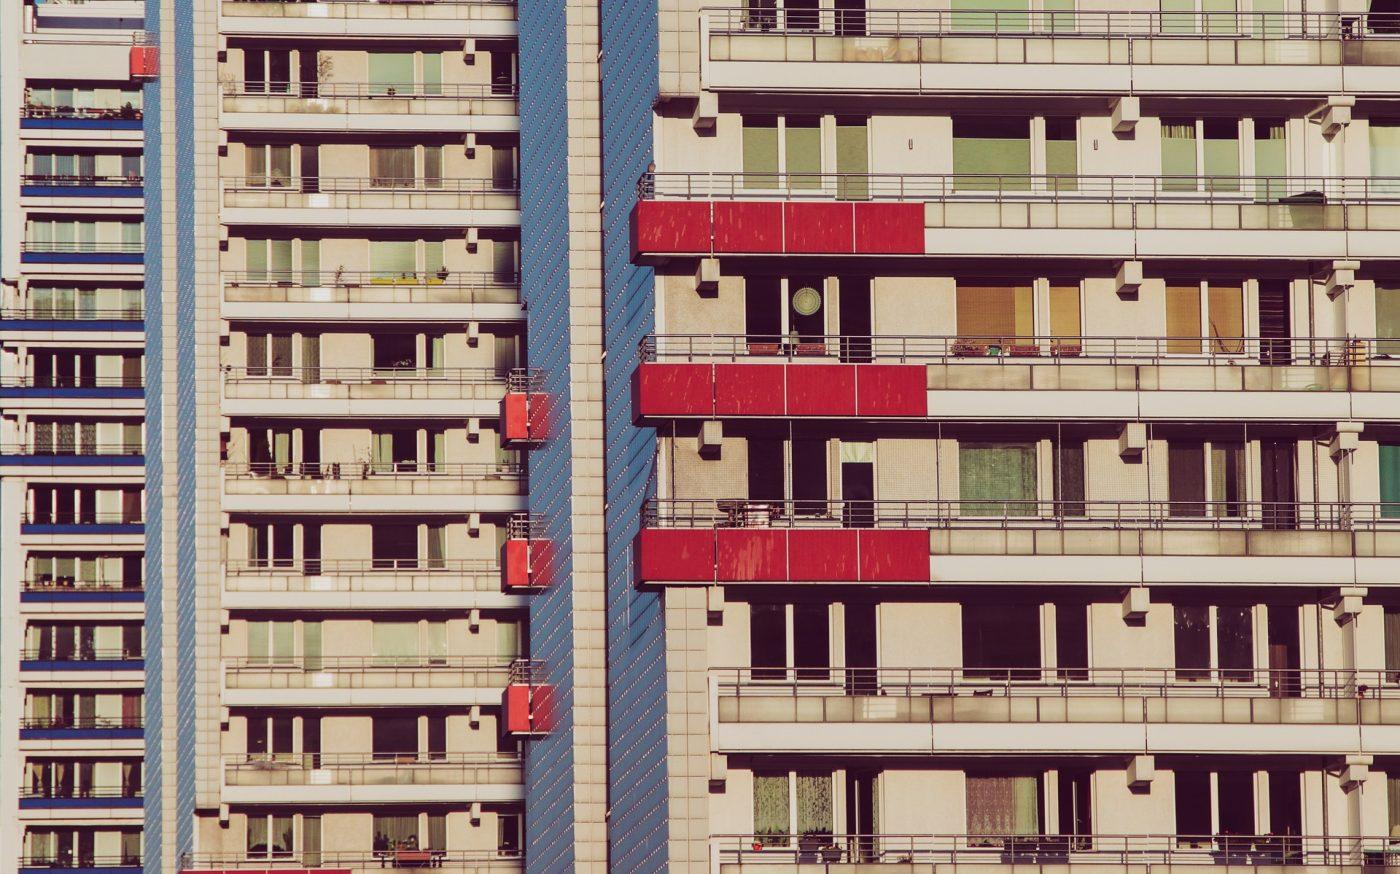 city-block-5020545_1920